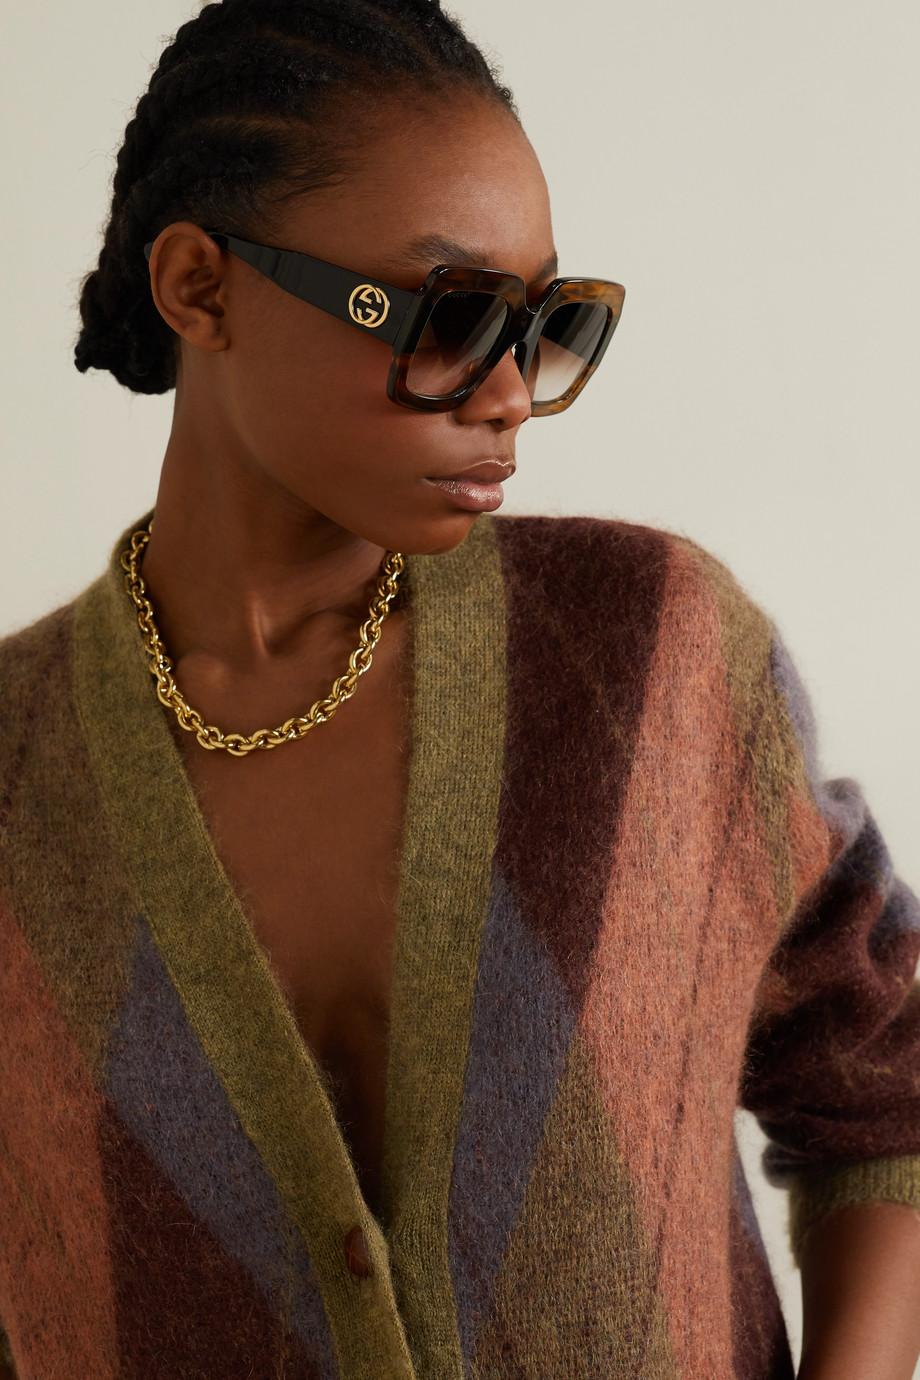 Gucci Oversized-Sonnenbrille mit eckigem Rahmen aus Azetat in Hornoptik